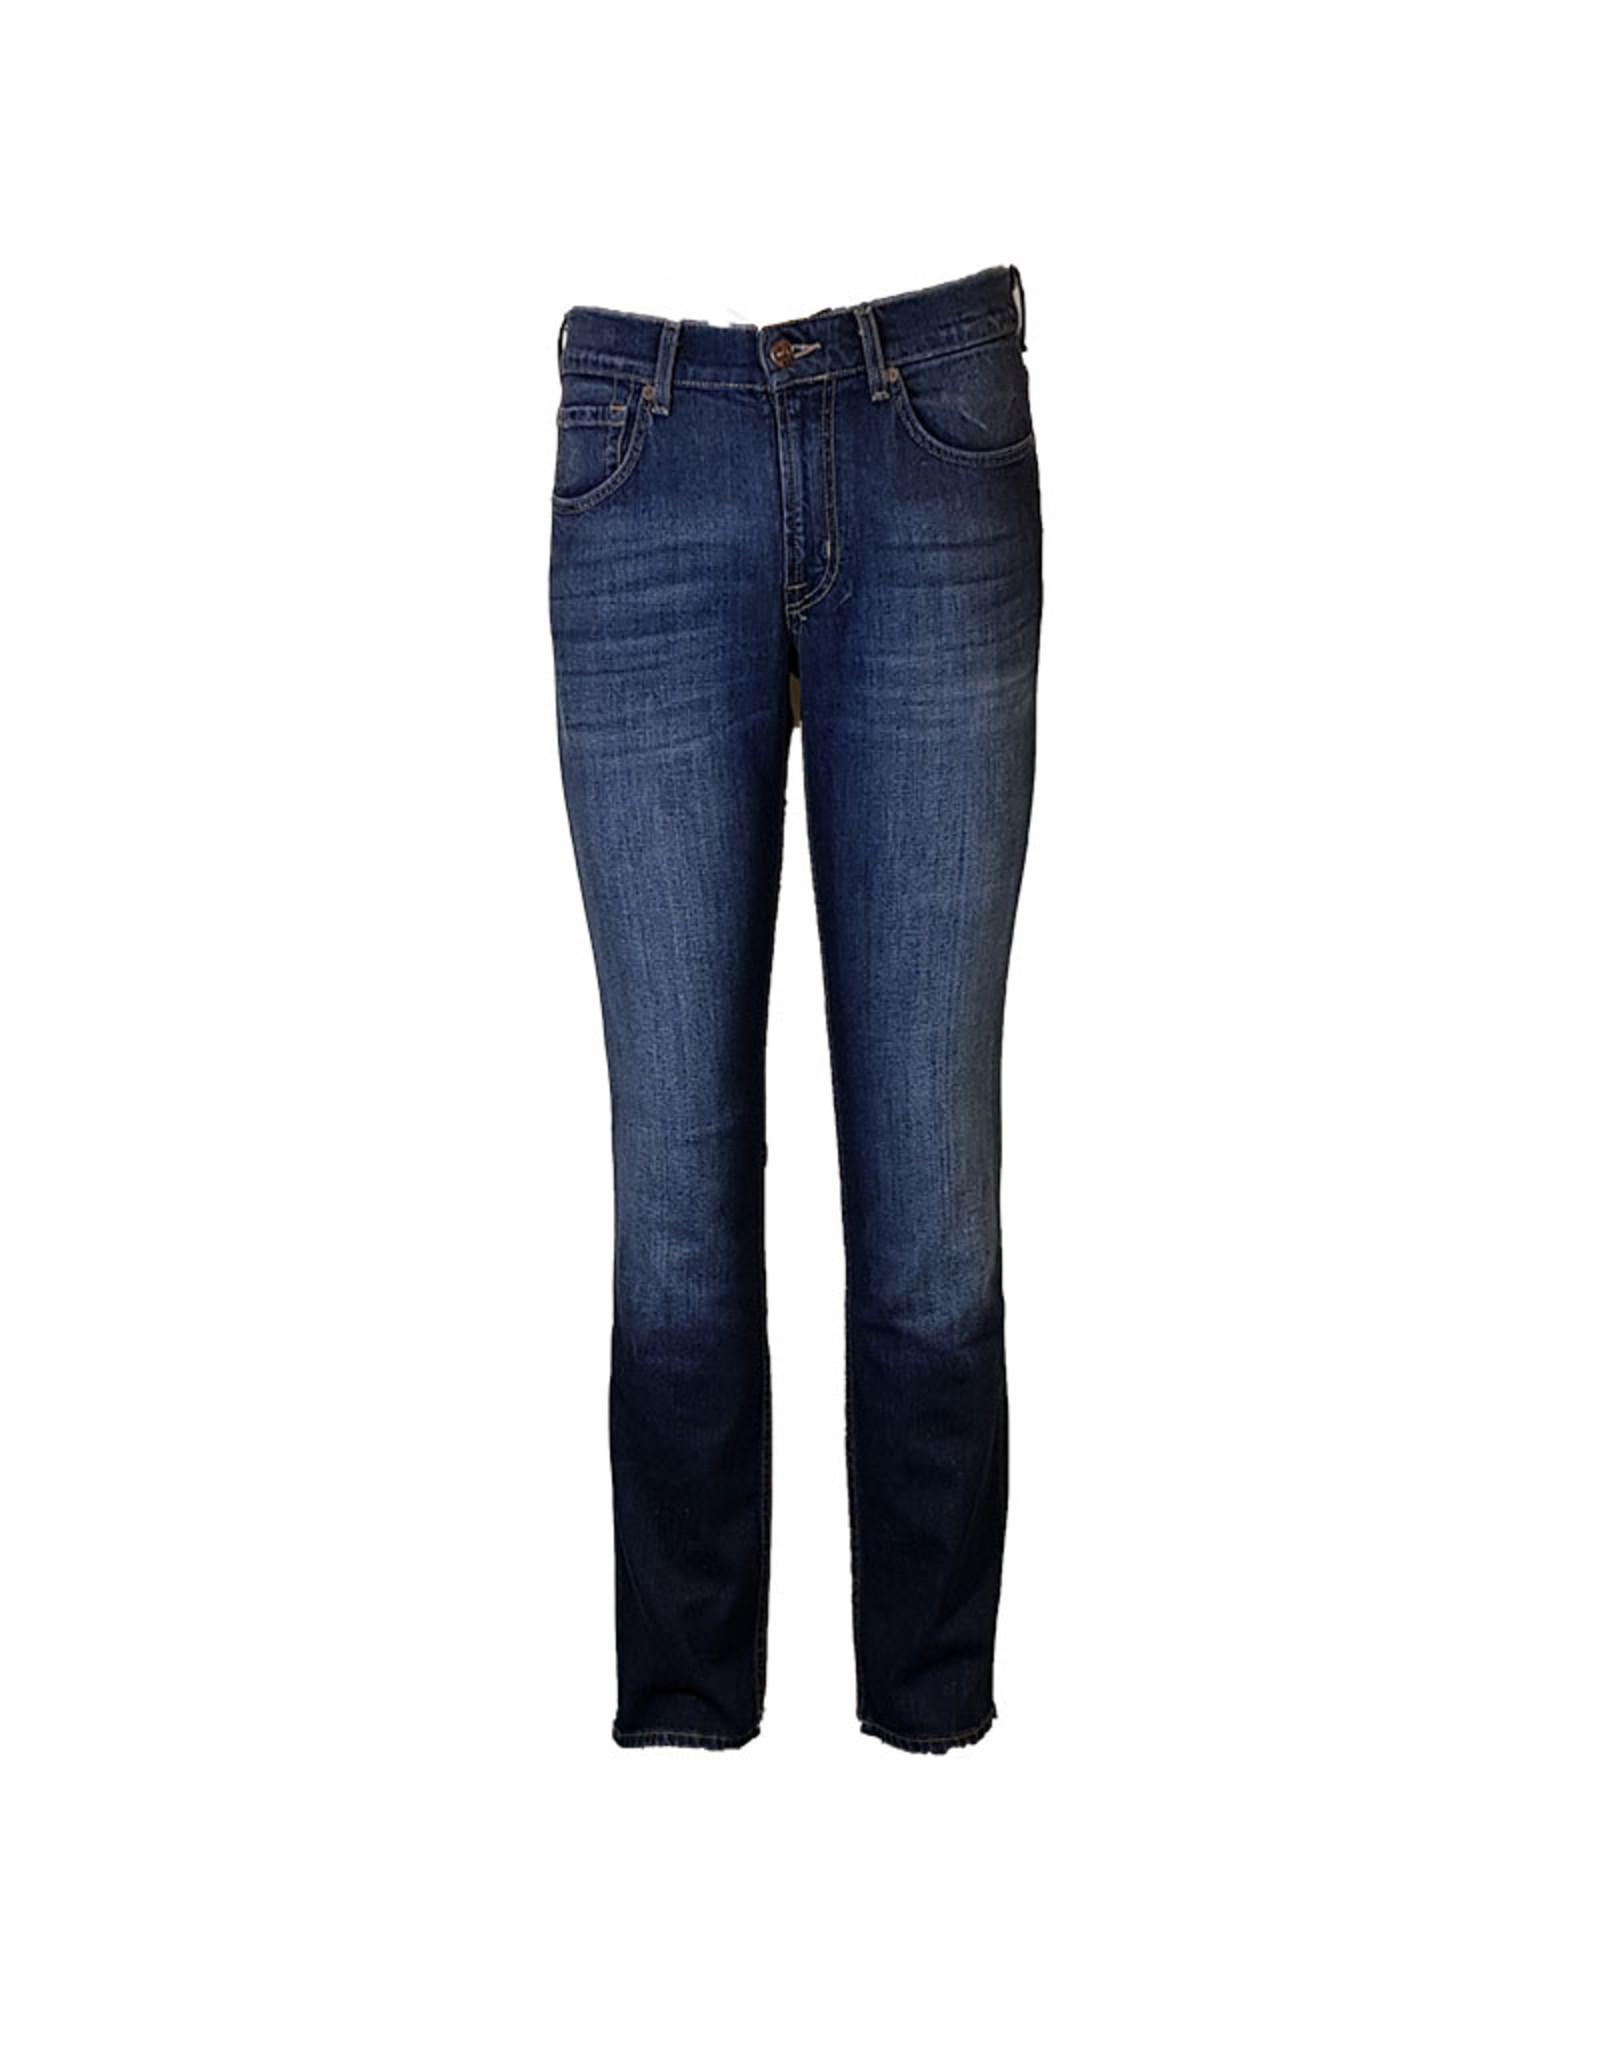 7 For All Mankind 7FAM jeans blauw slimmy SMSR450MW